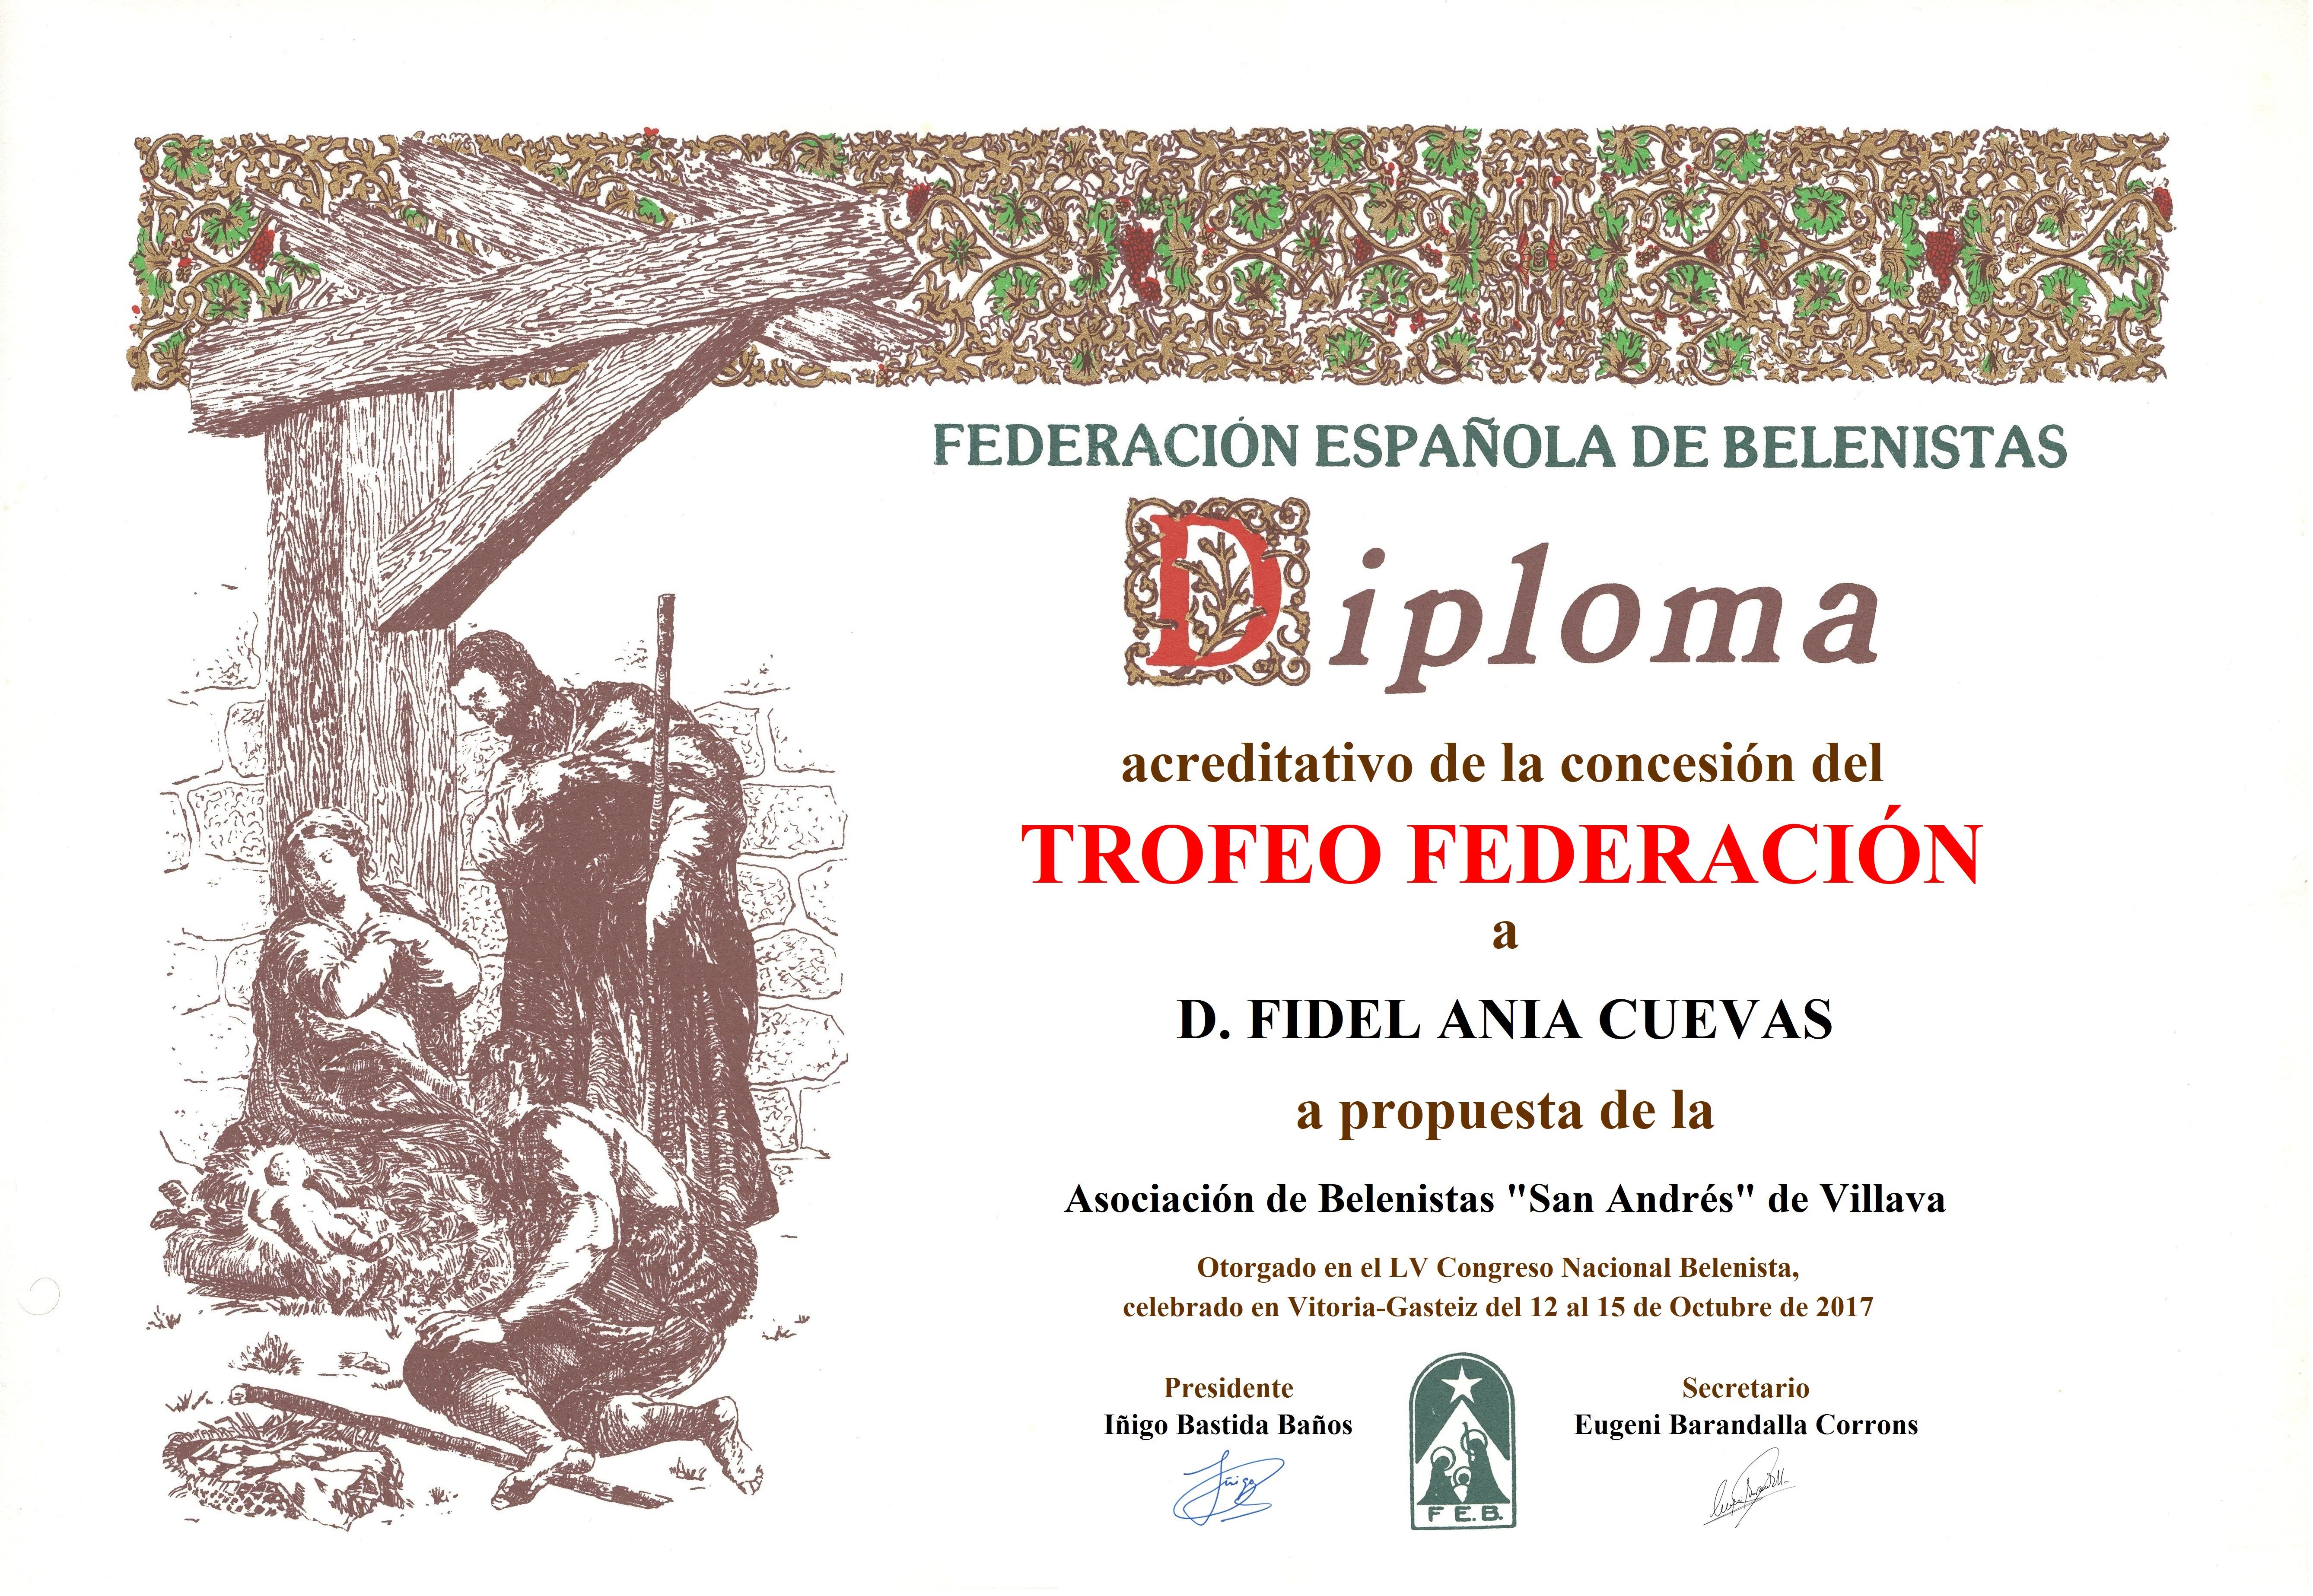 Fidel Ania Cuevas – Diploma Trofeo FEB 2017